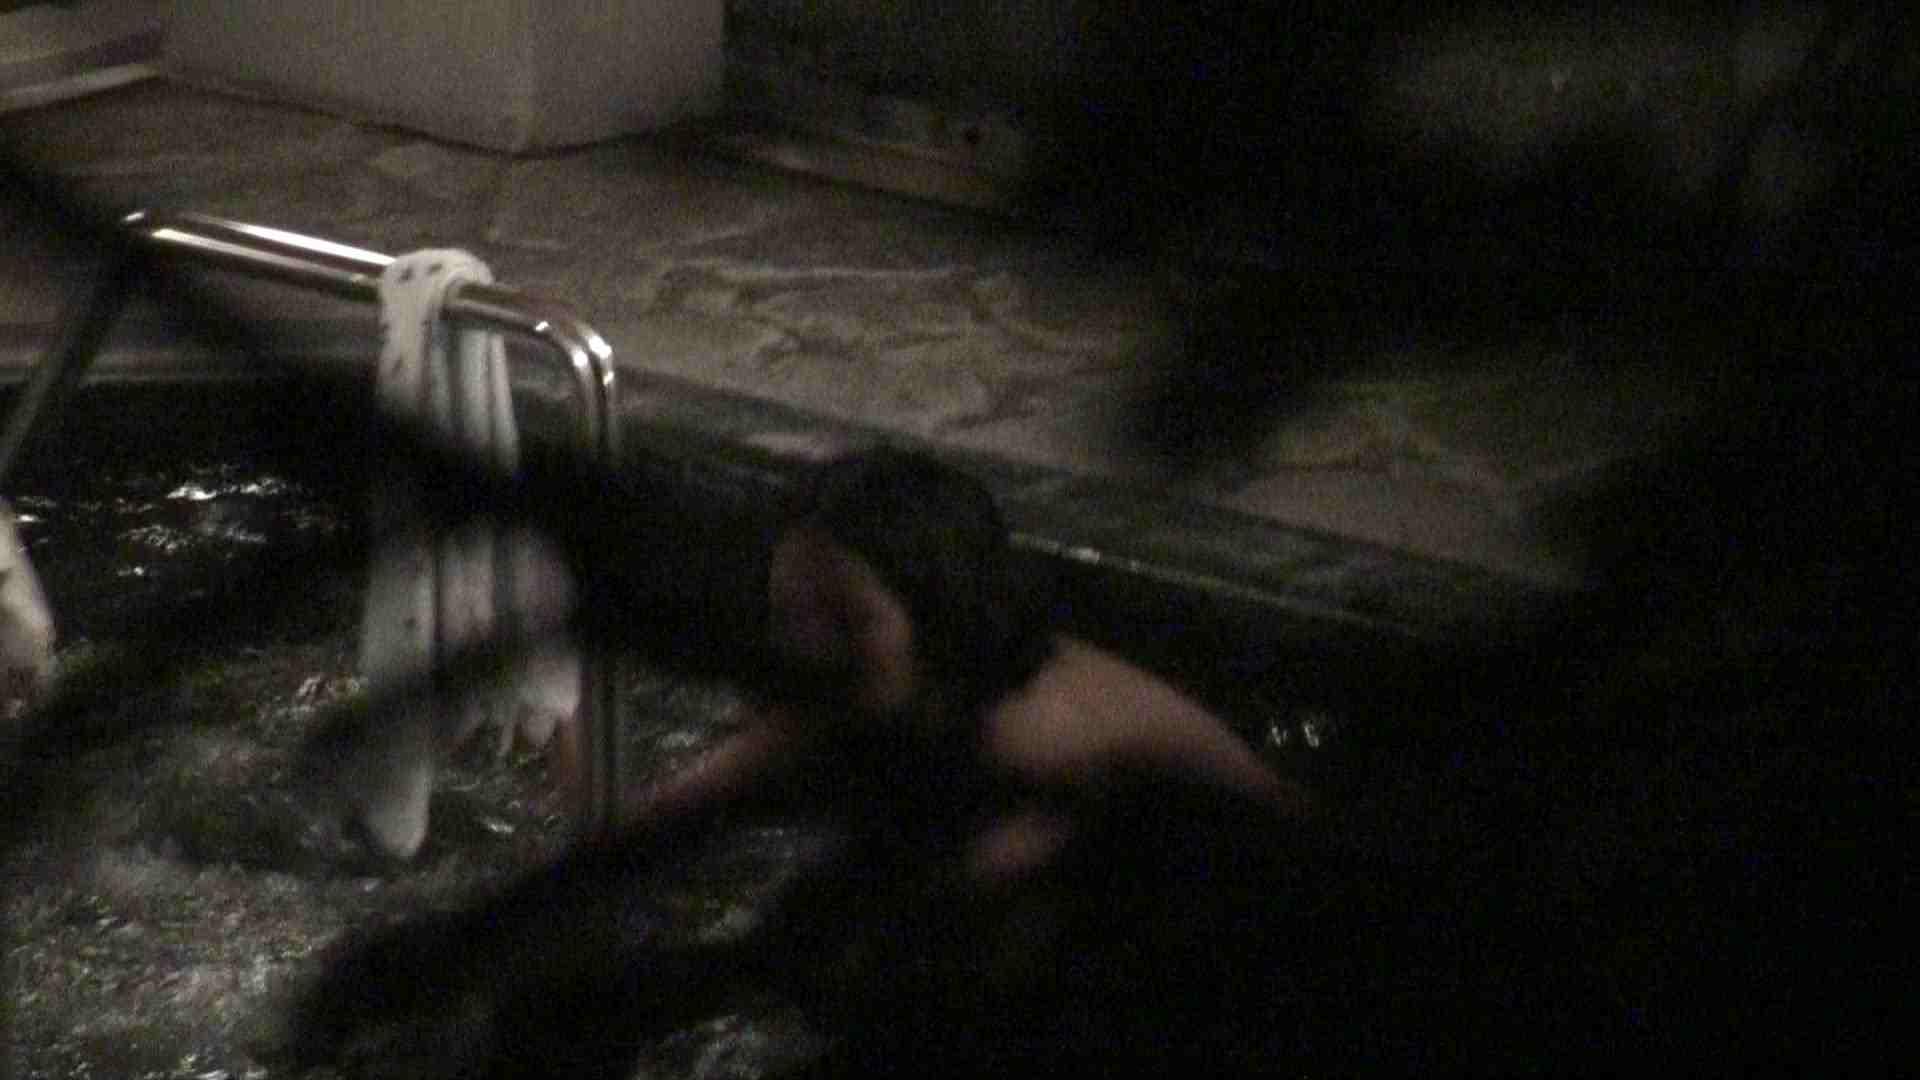 Aquaな露天風呂Vol.358 OLのエロ生活 おまんこ無修正動画無料 50連発 11